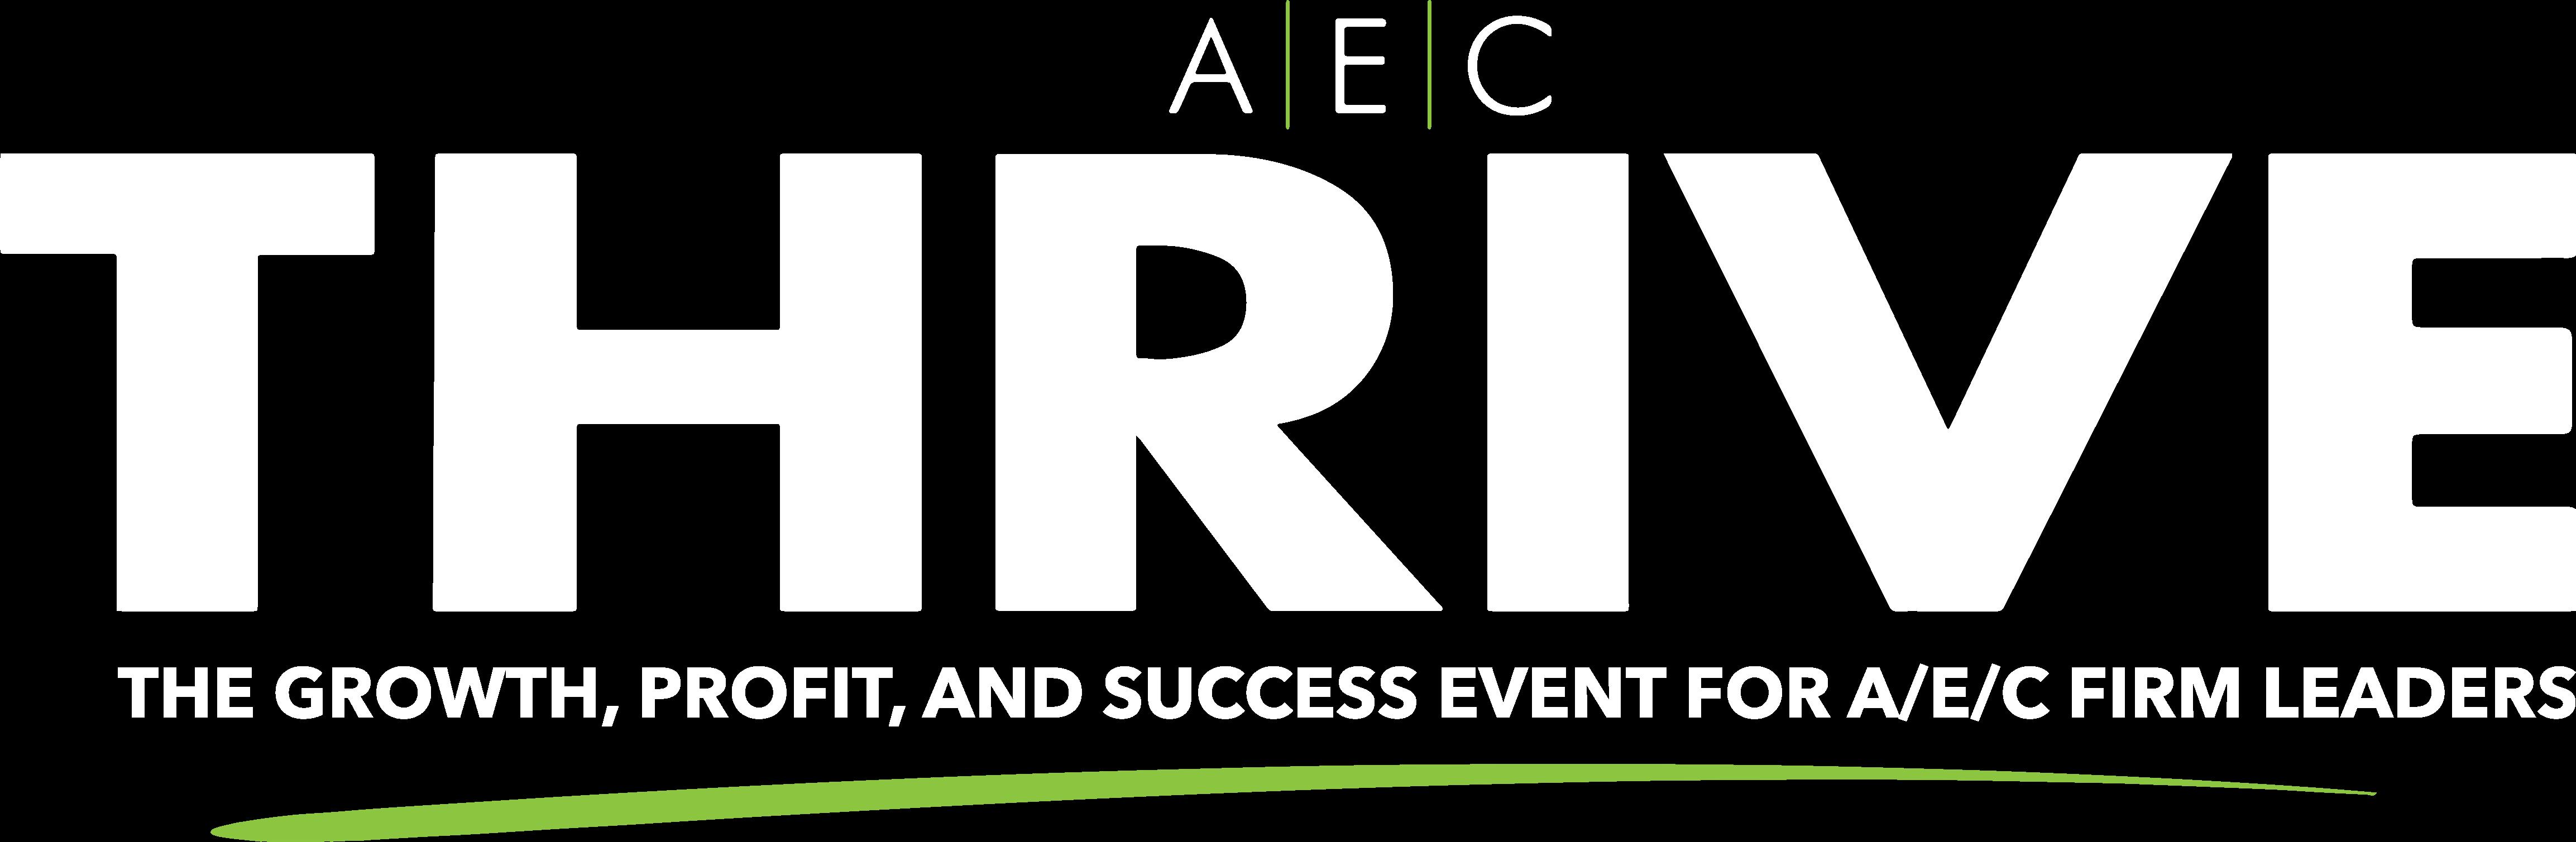 A/E/C THRIVE 2020